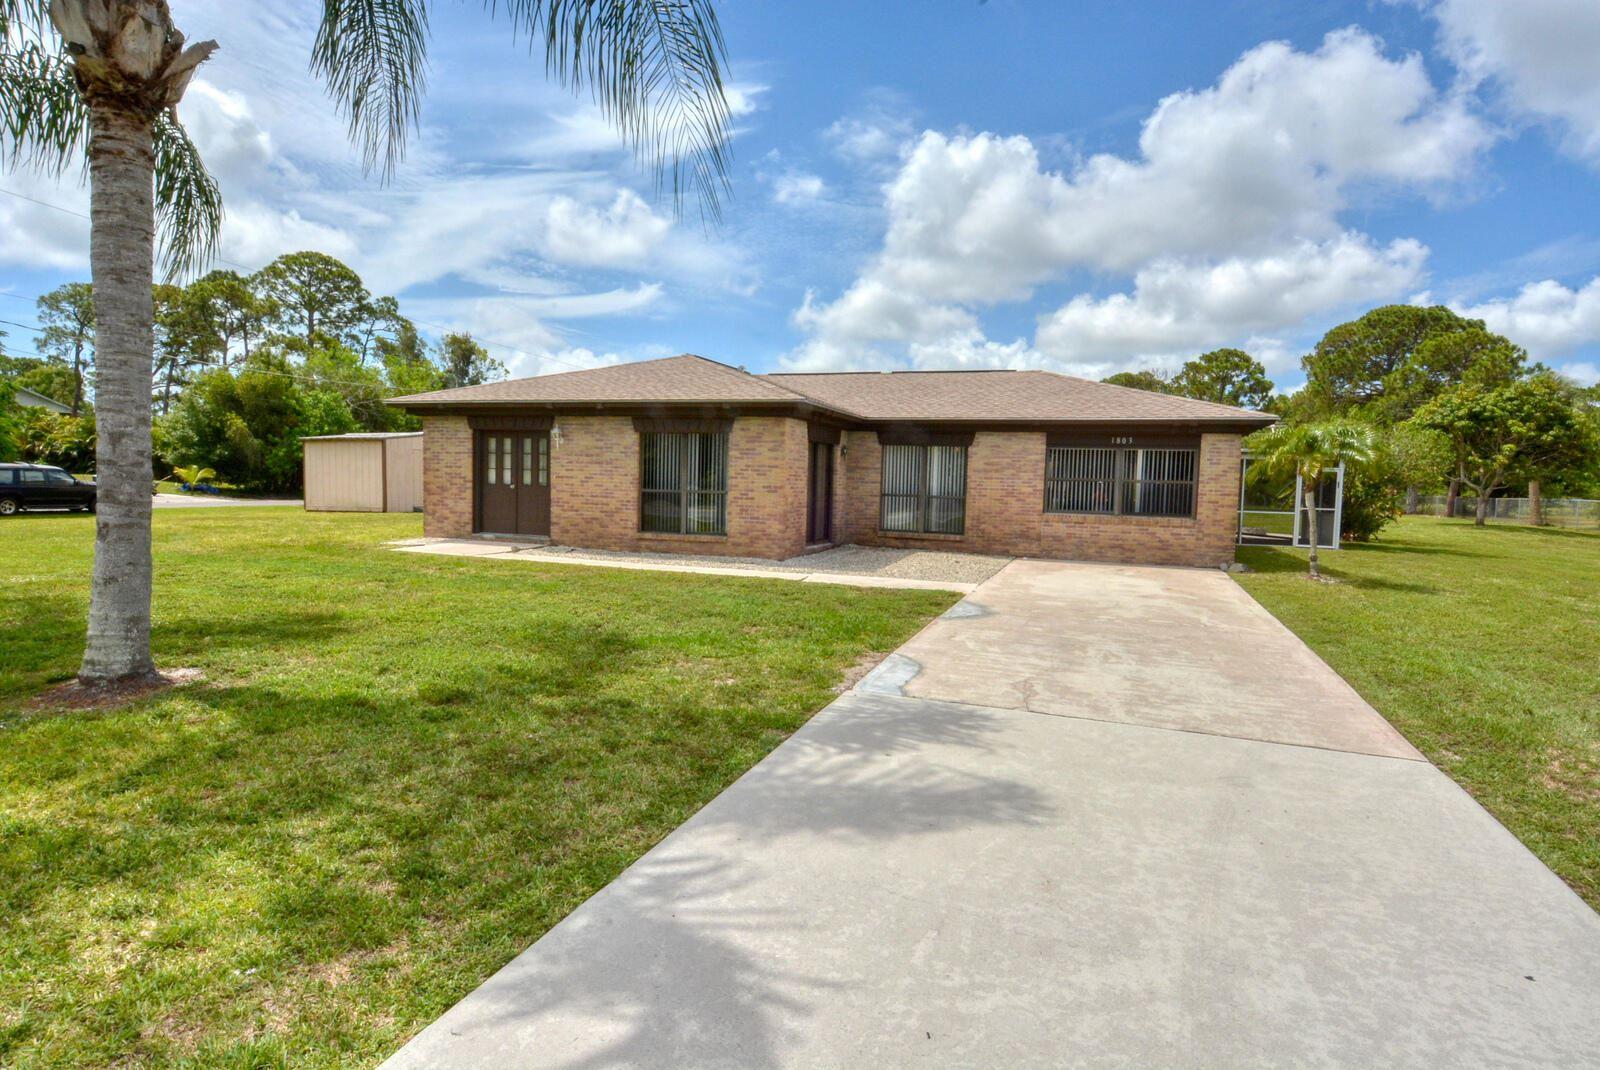 1803 Easy Street, Fort Pierce, FL 34982 - #: RX-10723195